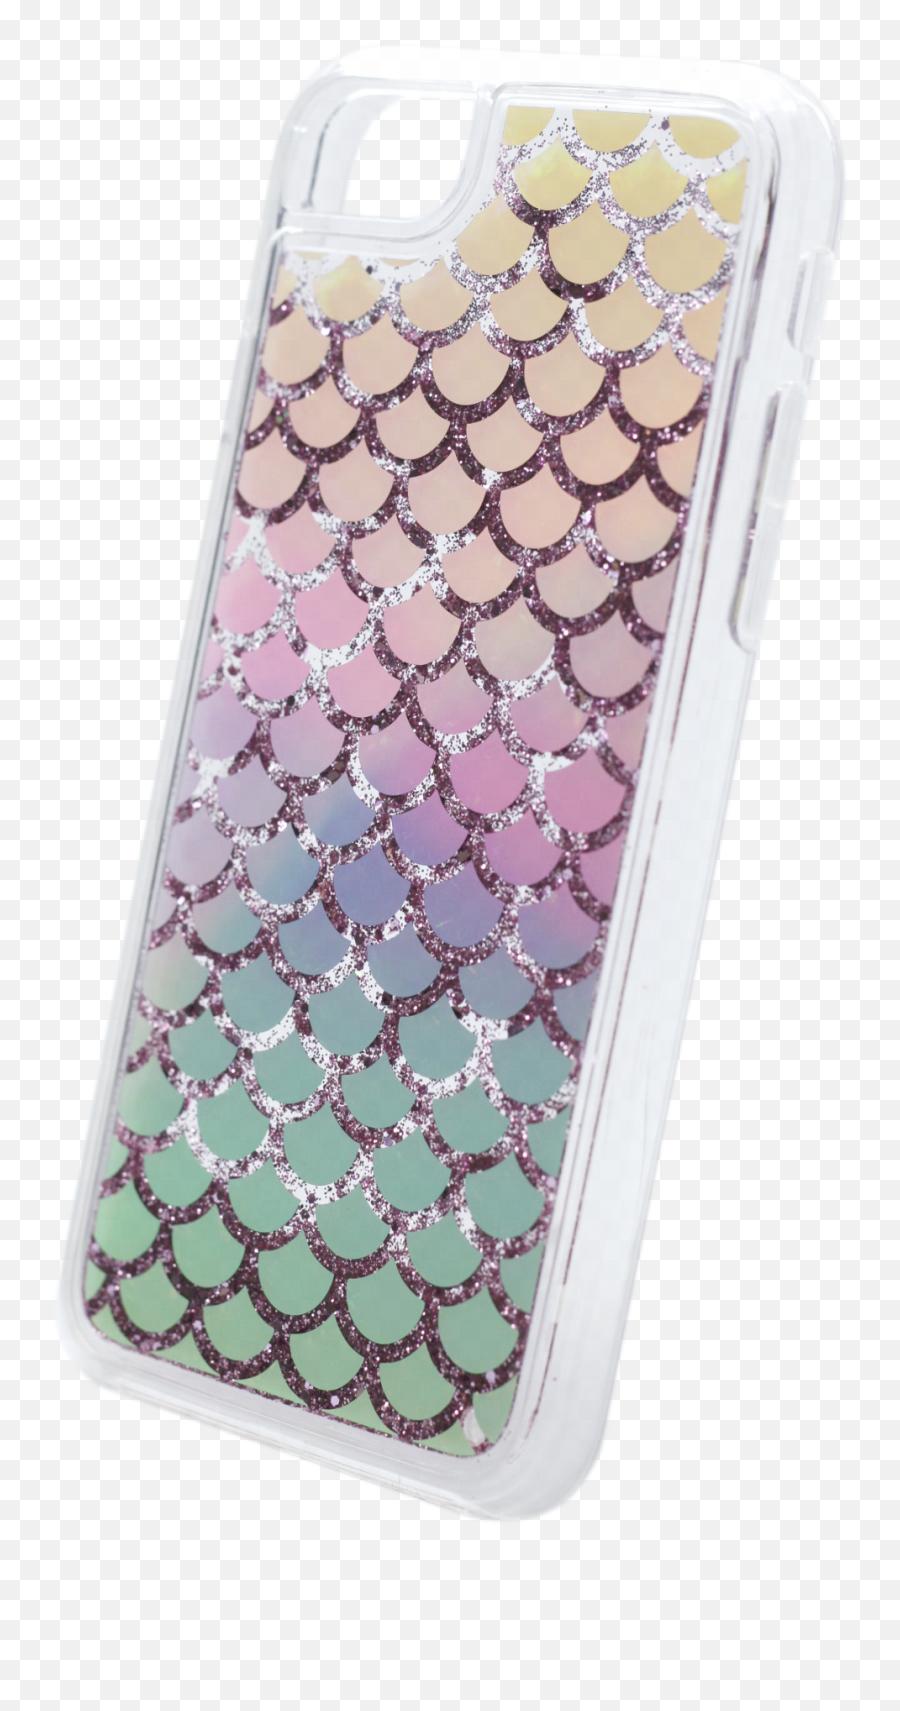 Iphone 8 - Iphone Emoji,Mermaid Emoji For Iphone